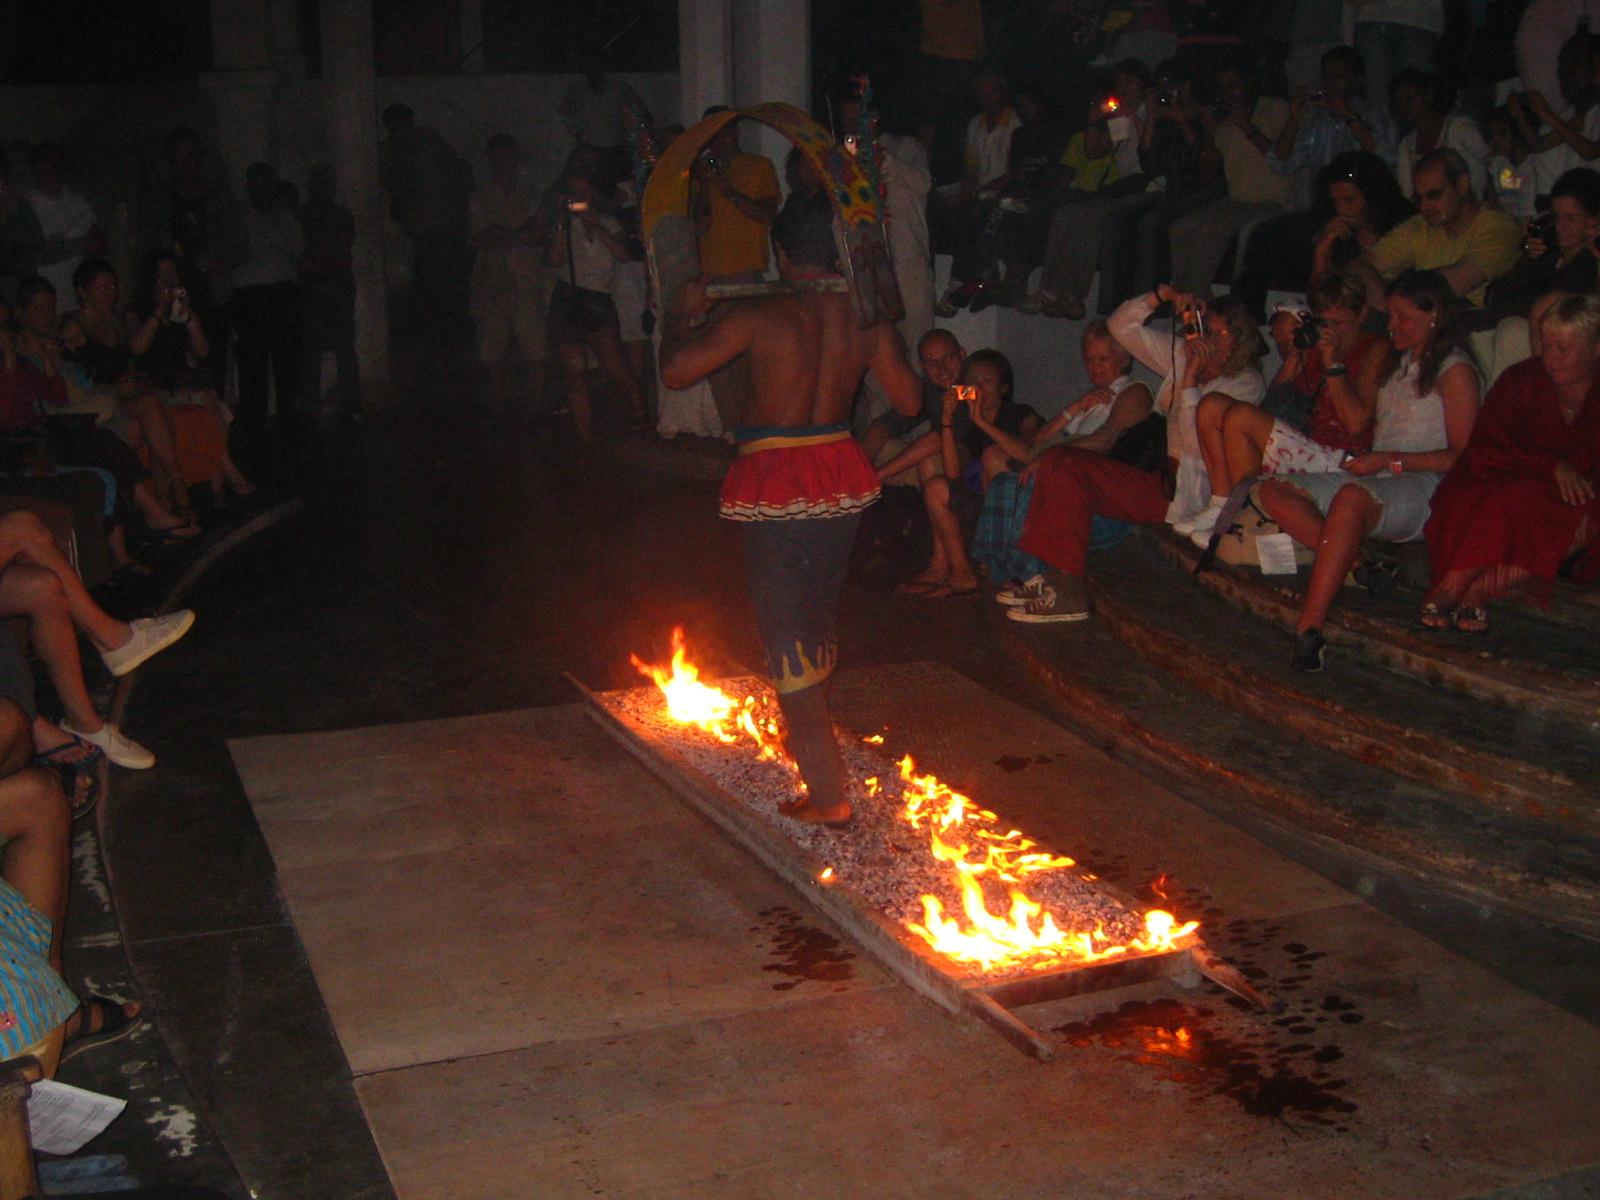 http://4.bp.blogspot.com/-R5ffN-gXKnU/T4IMvi25fSI/AAAAAAAAAAQ/hjs37VtZIHY/s1600/Fire_Walking_(1234969885).jpg